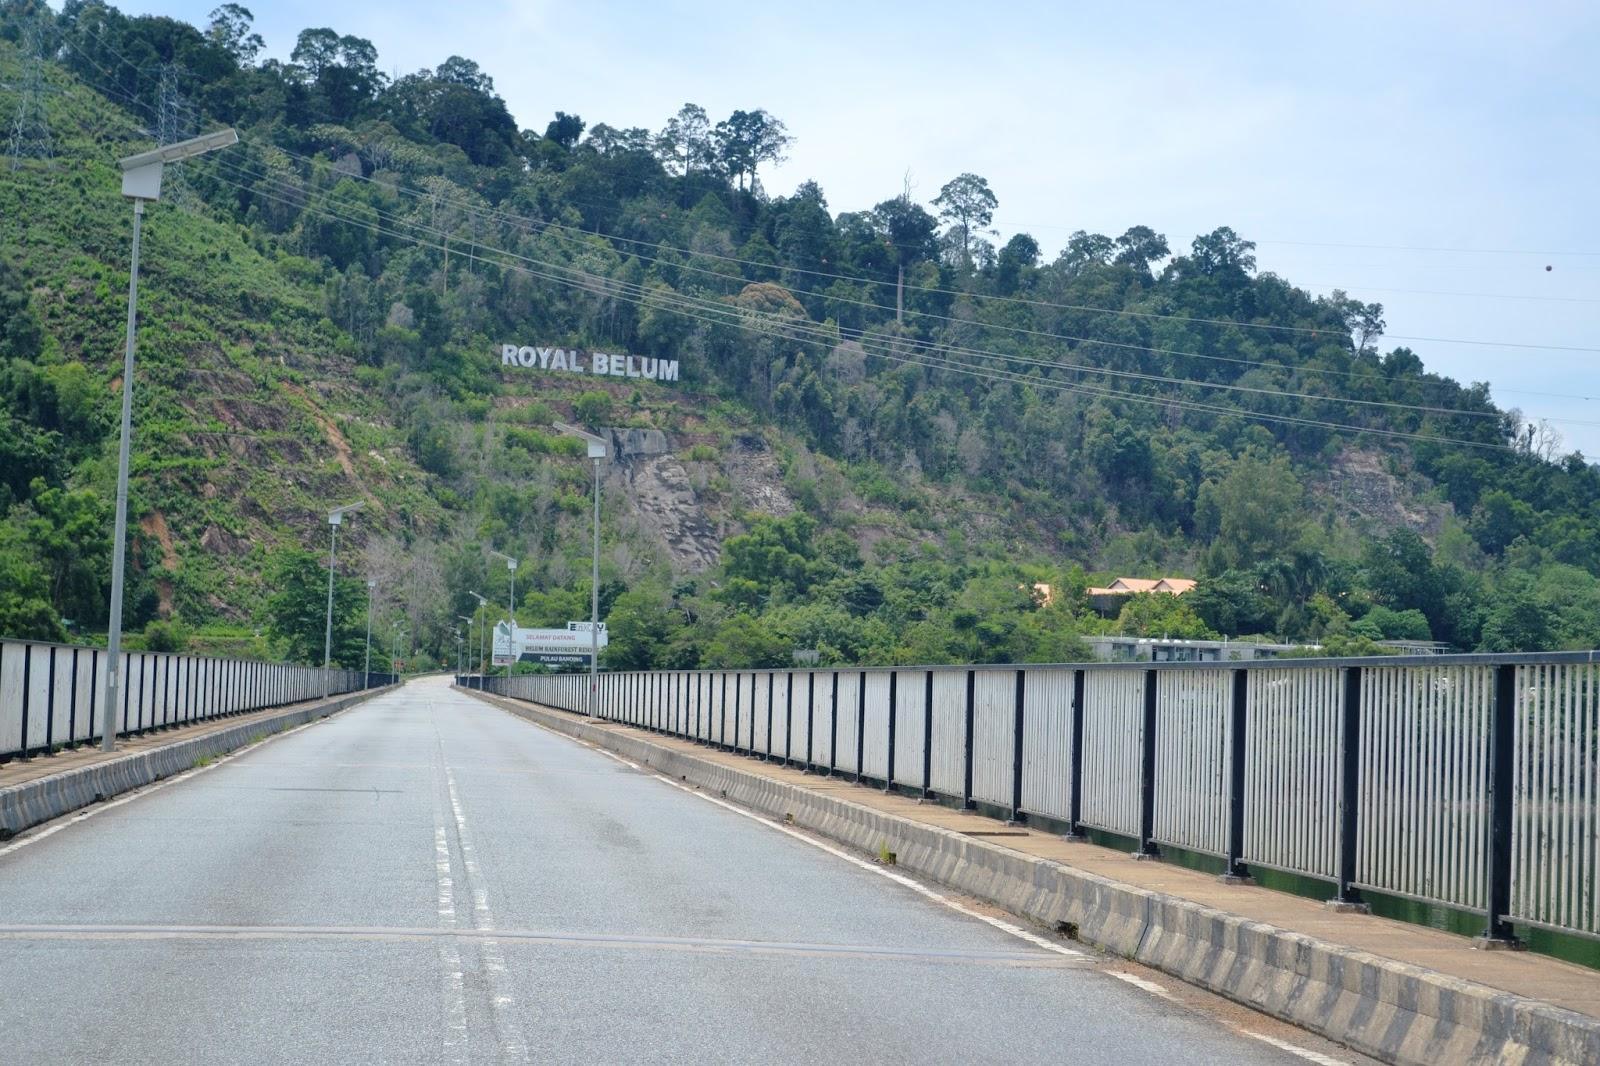 Diari Si Ketam Batu Kembara Libur Kota Bharu Kuala Terengganu Kuantan 2015 Fasa 01 Tm Kb